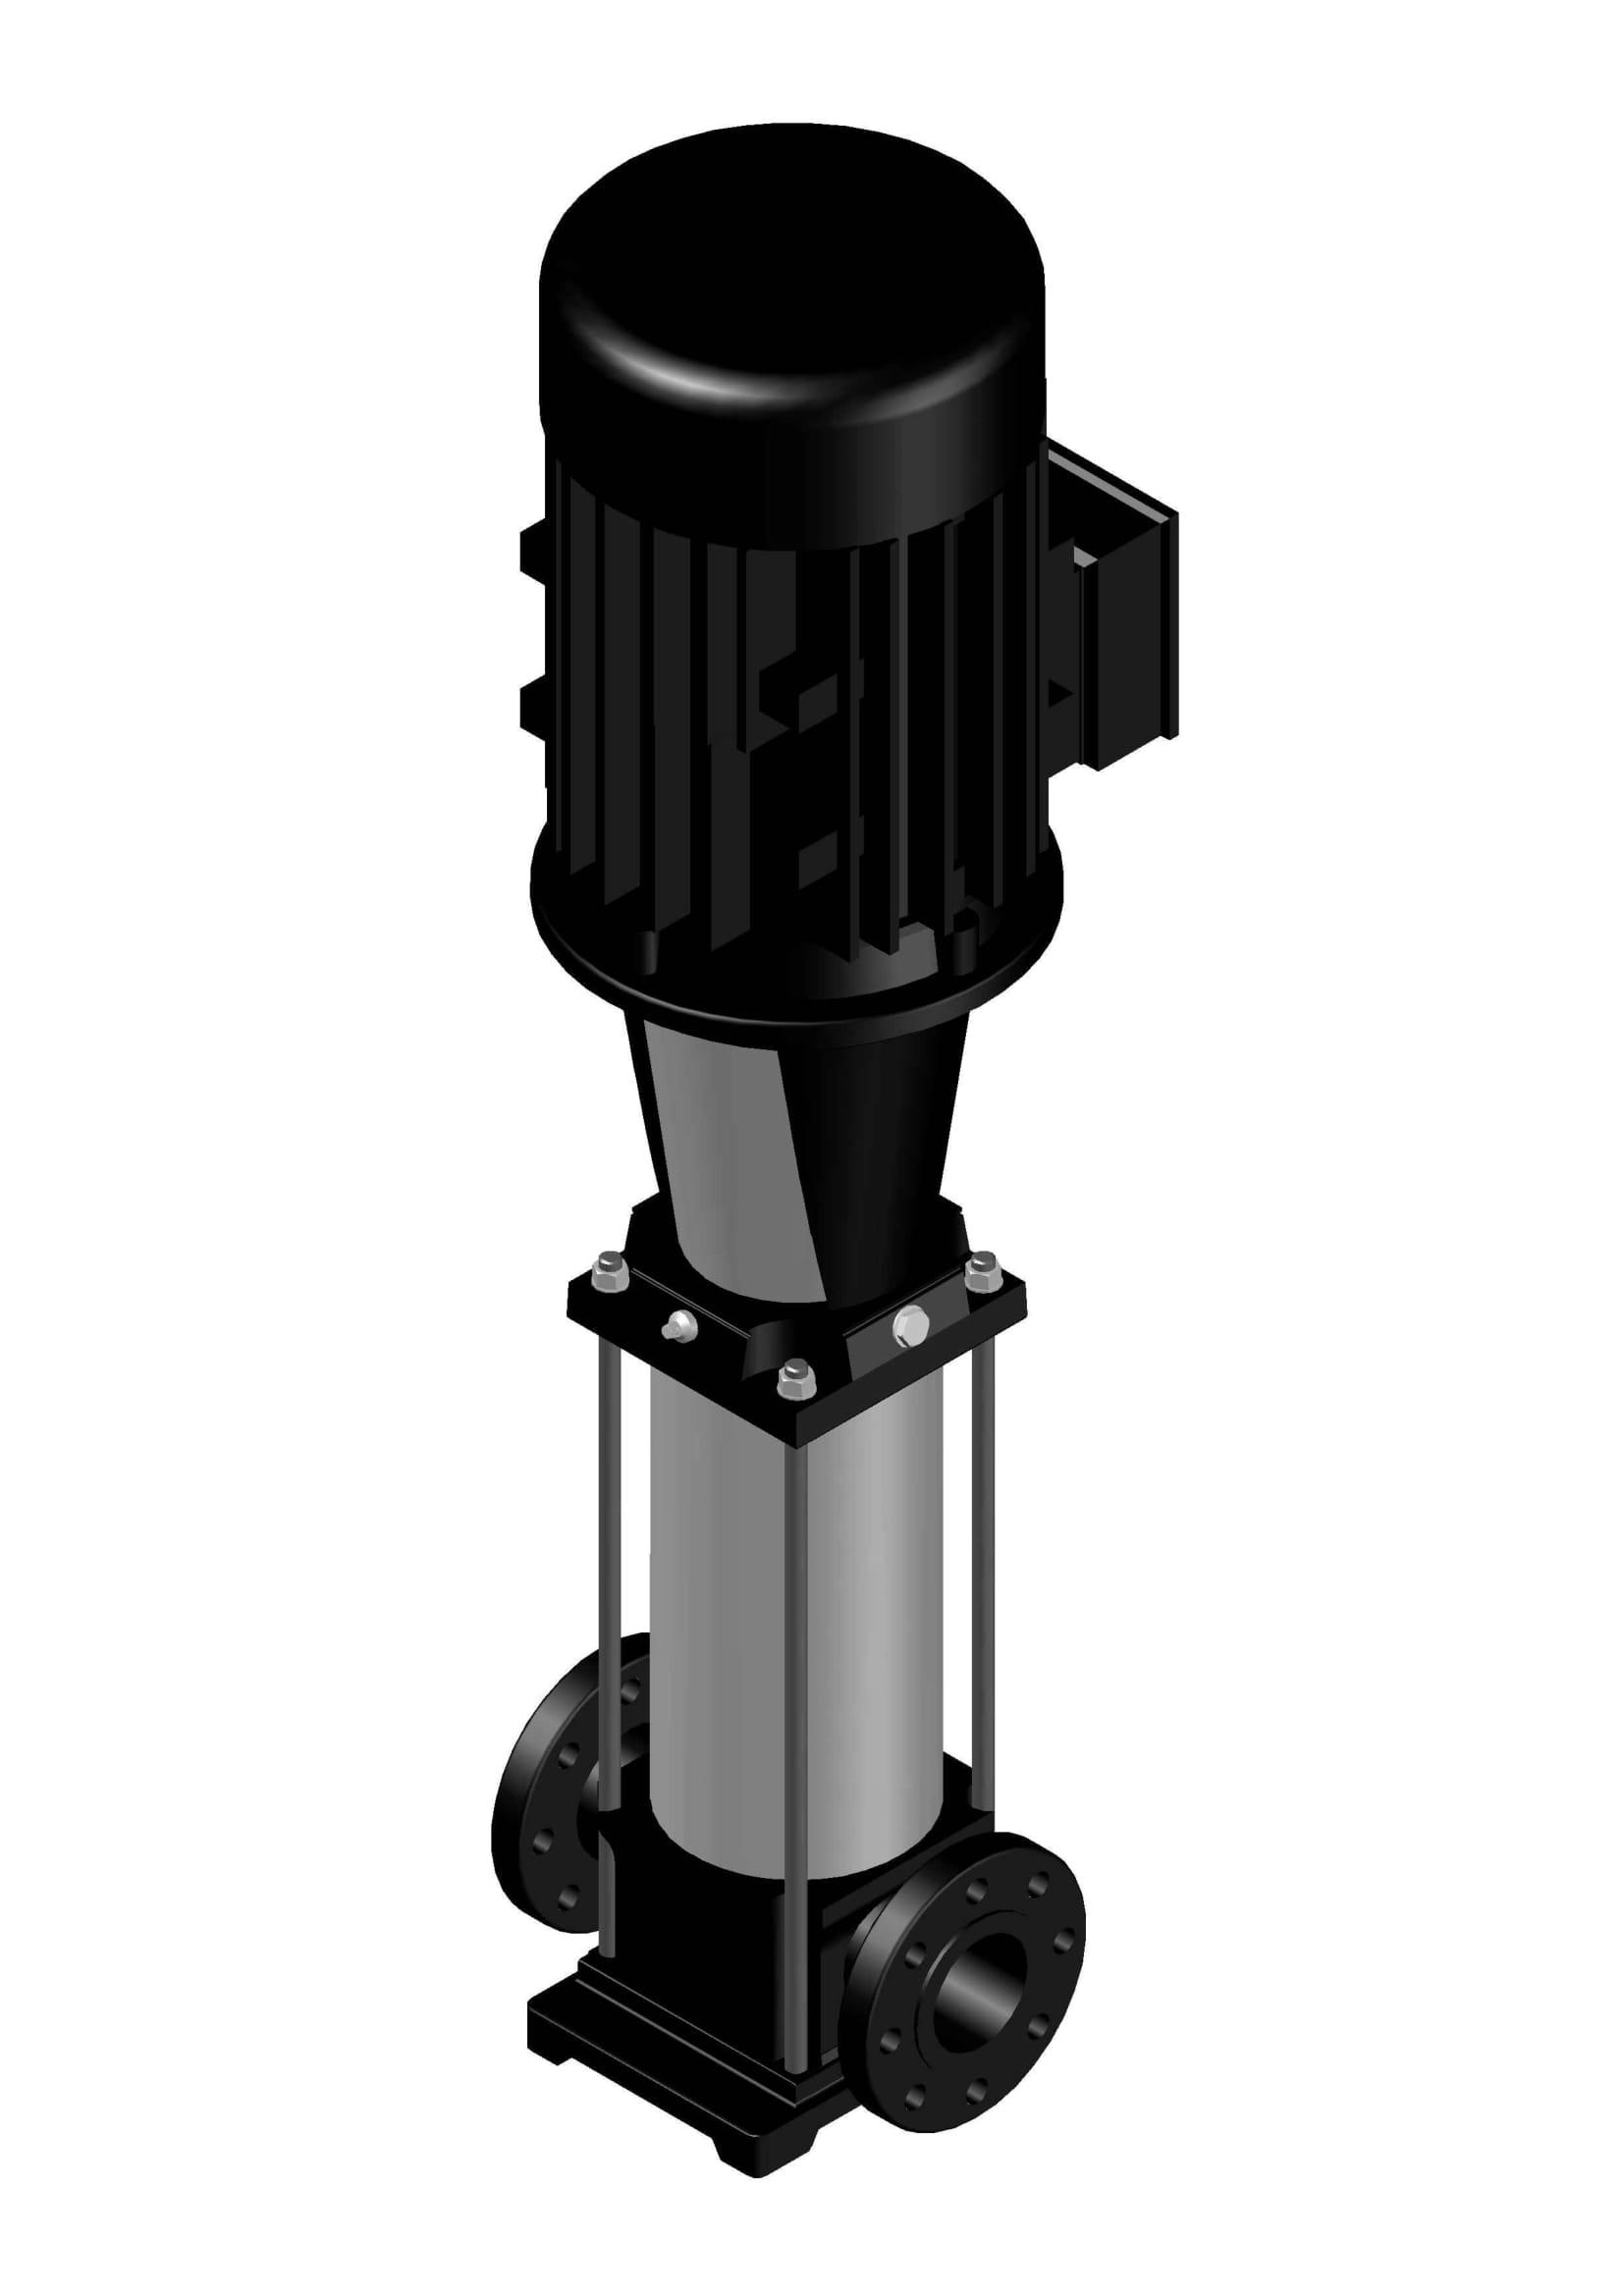 BV 64-04